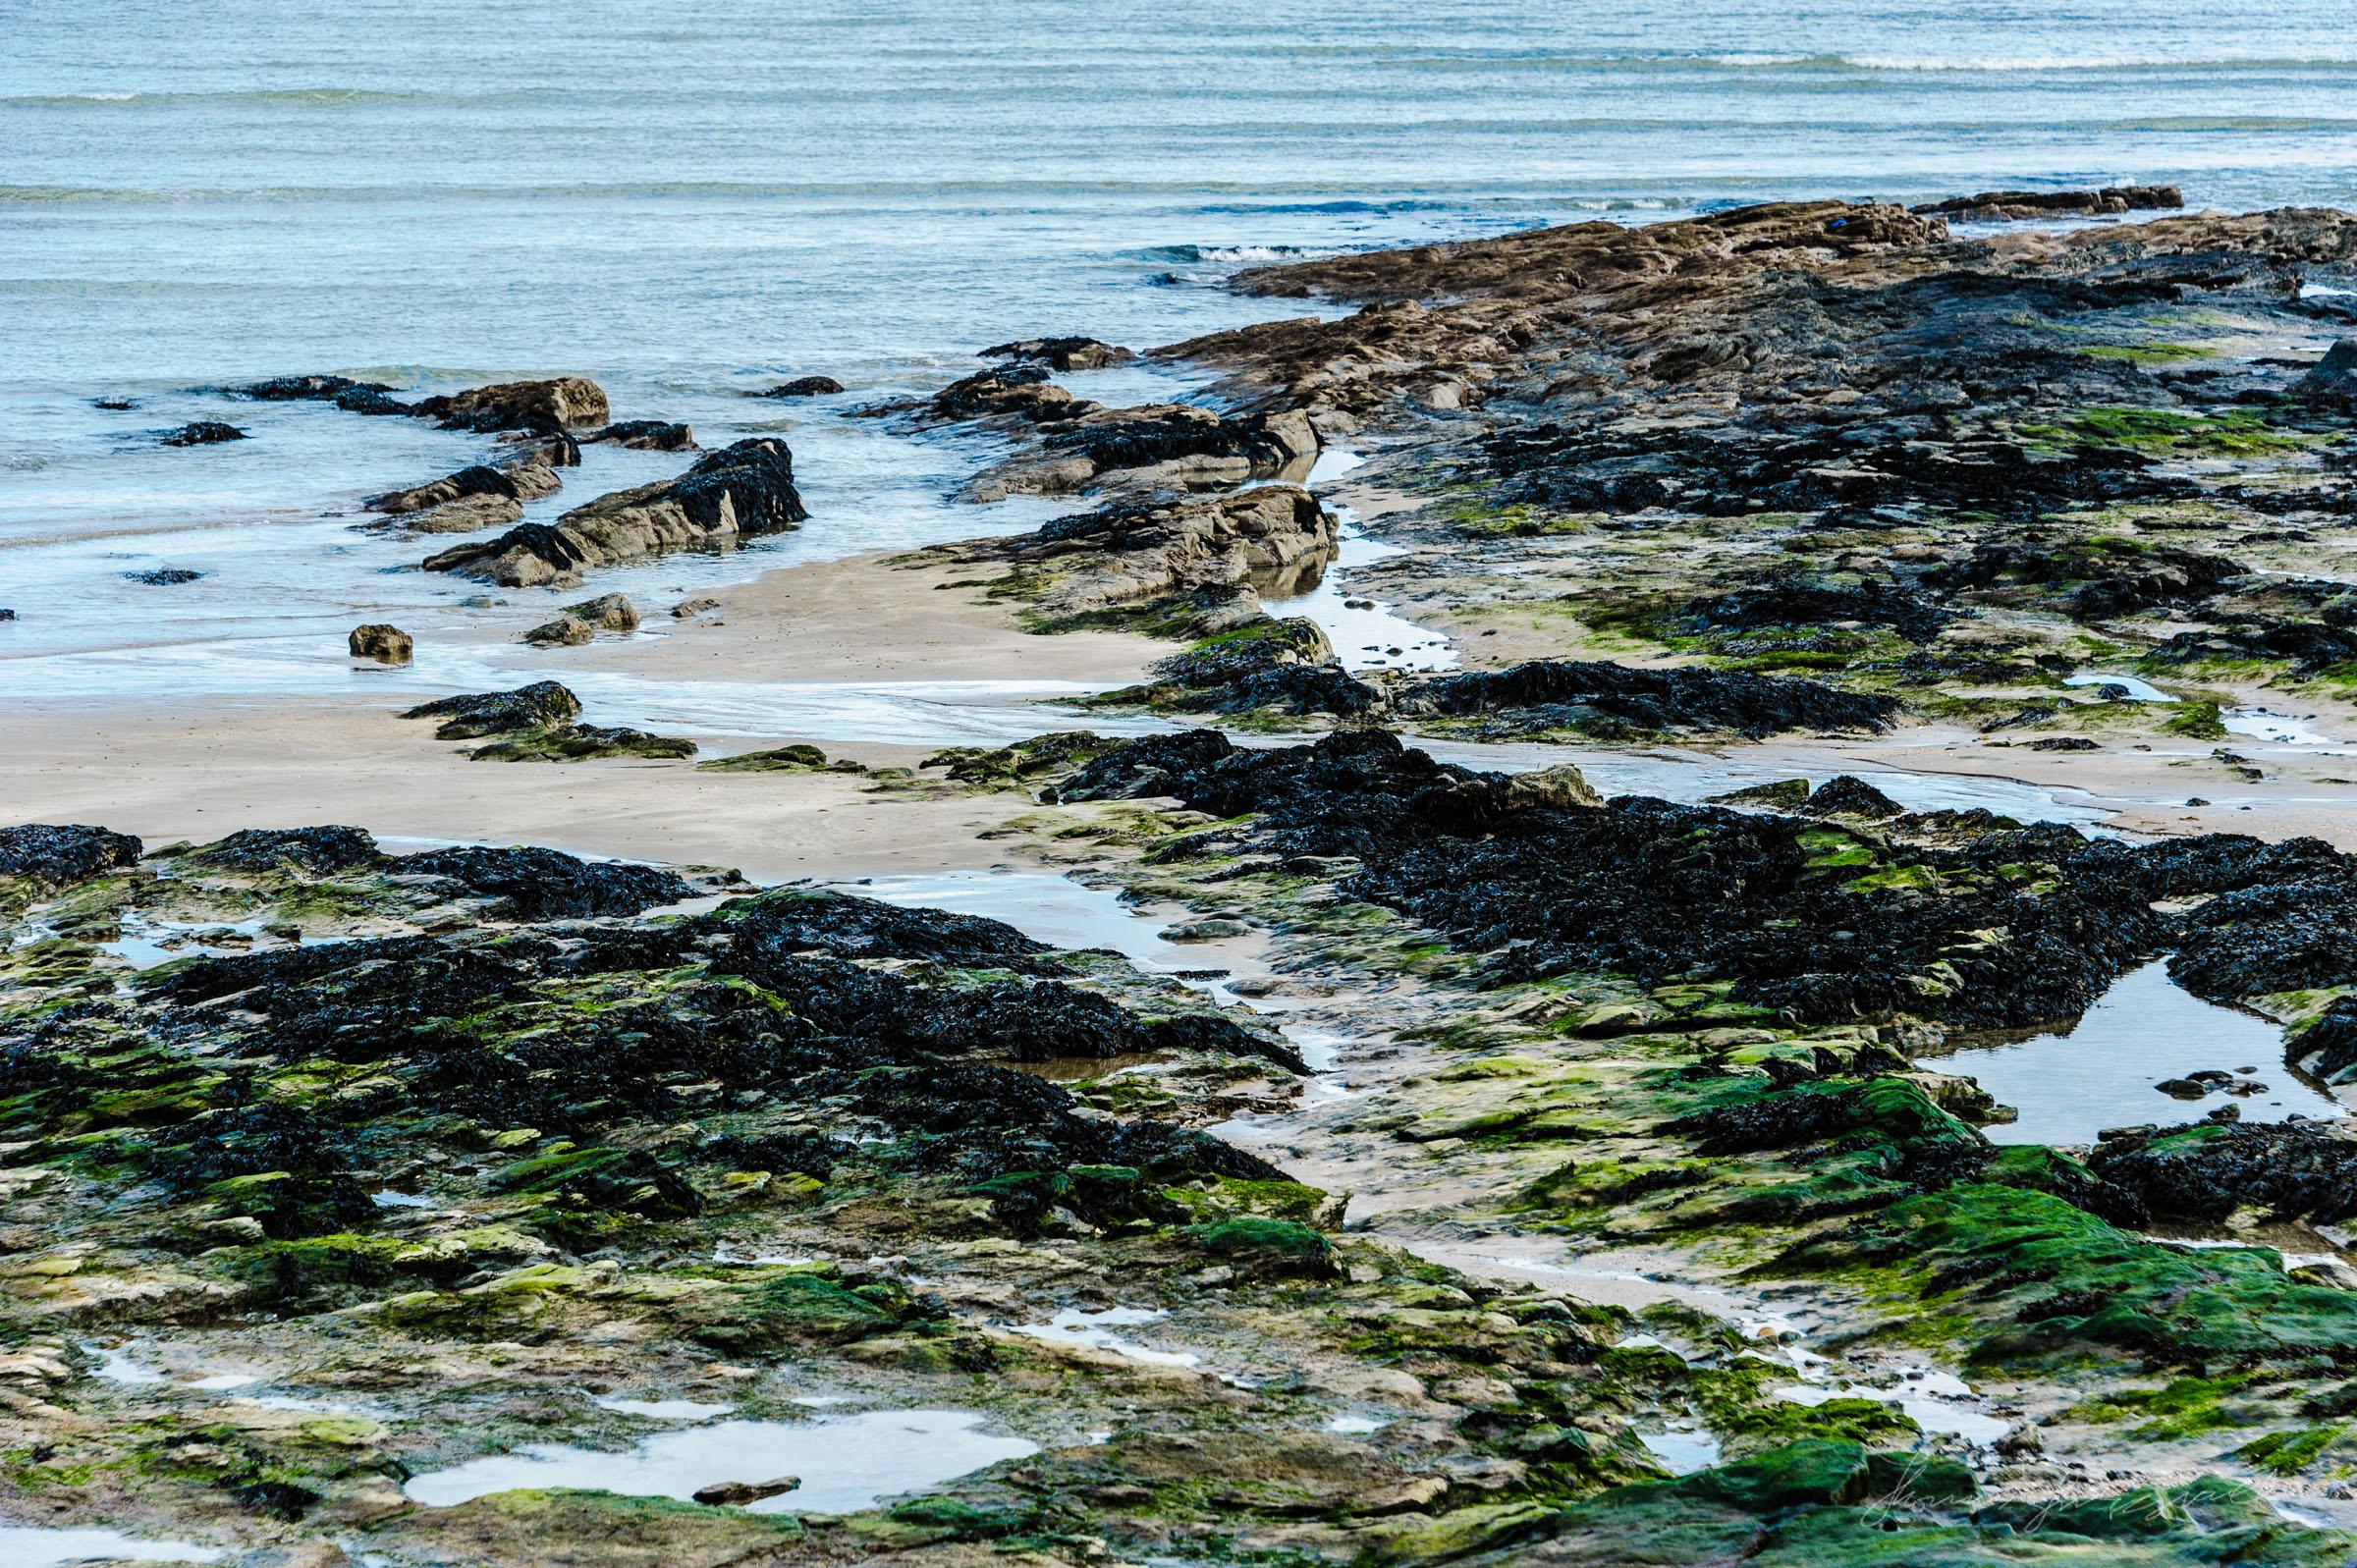 Rocky Shoreline at Malahide, North Co. Dublin